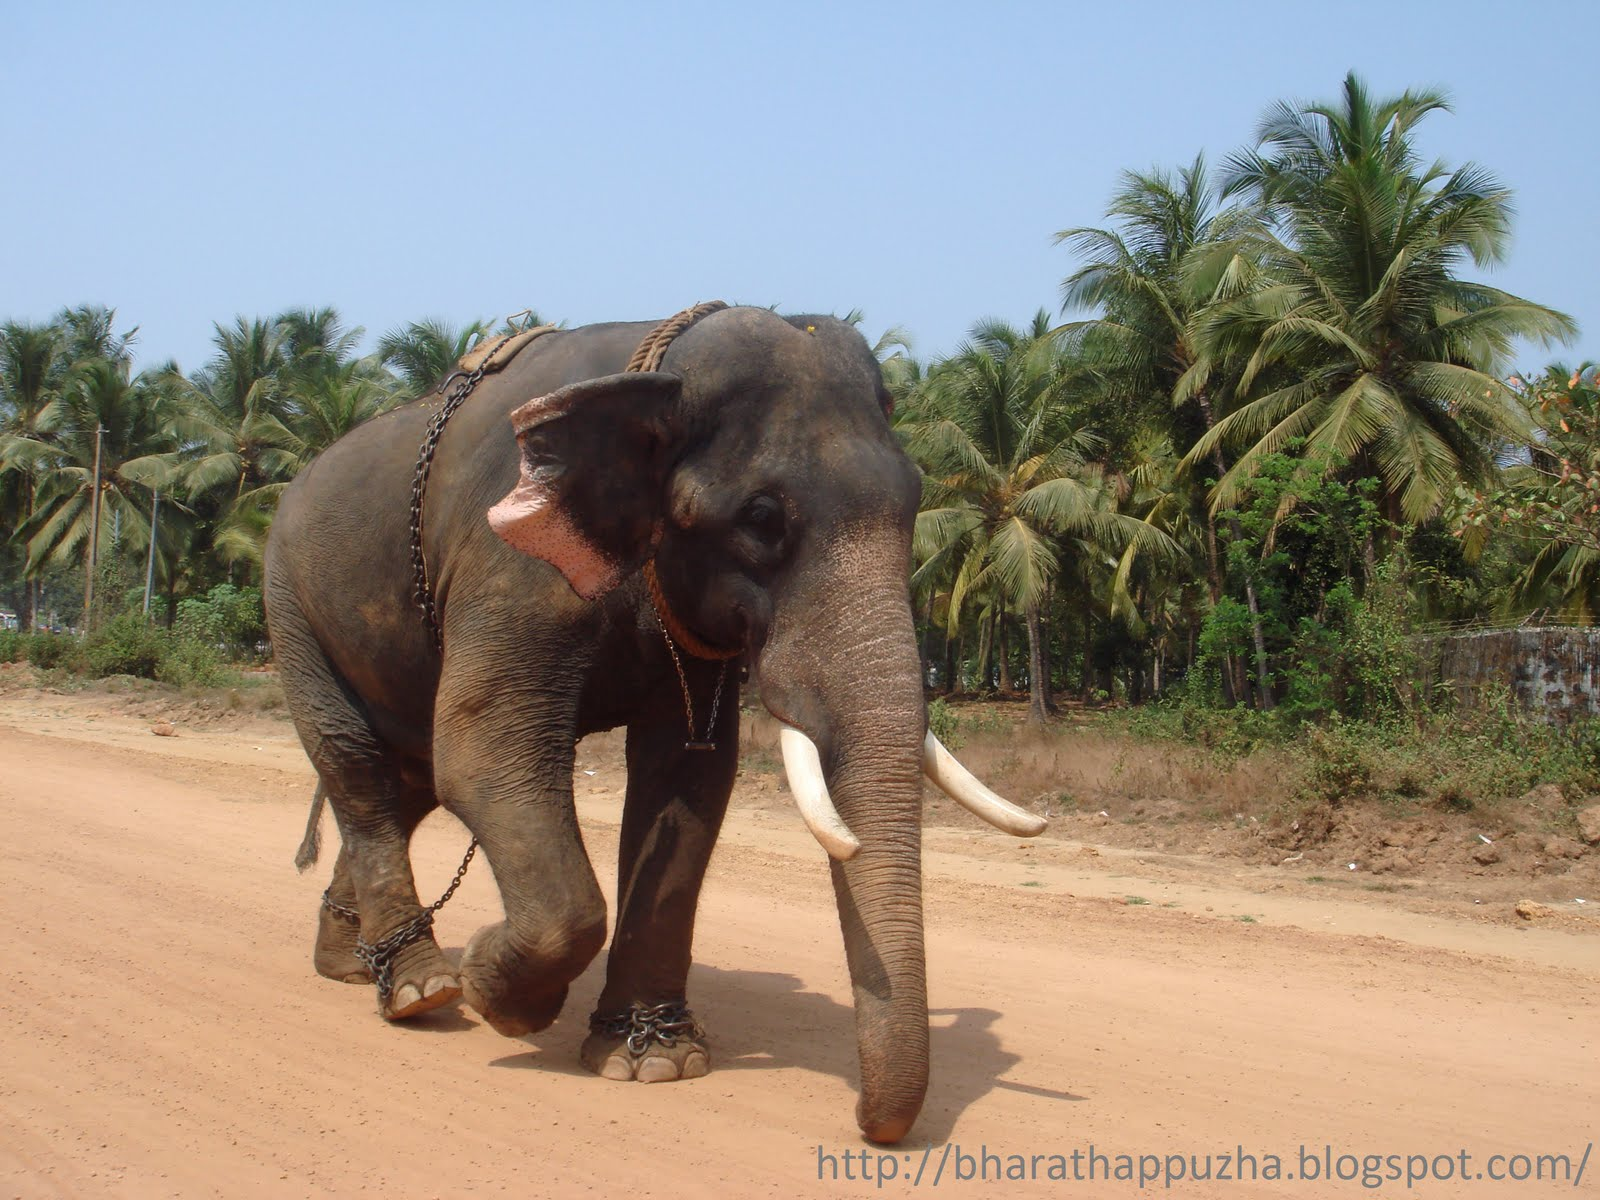 Kerala Elephant Wallpaper Kerala Elephant 2012527 Hd